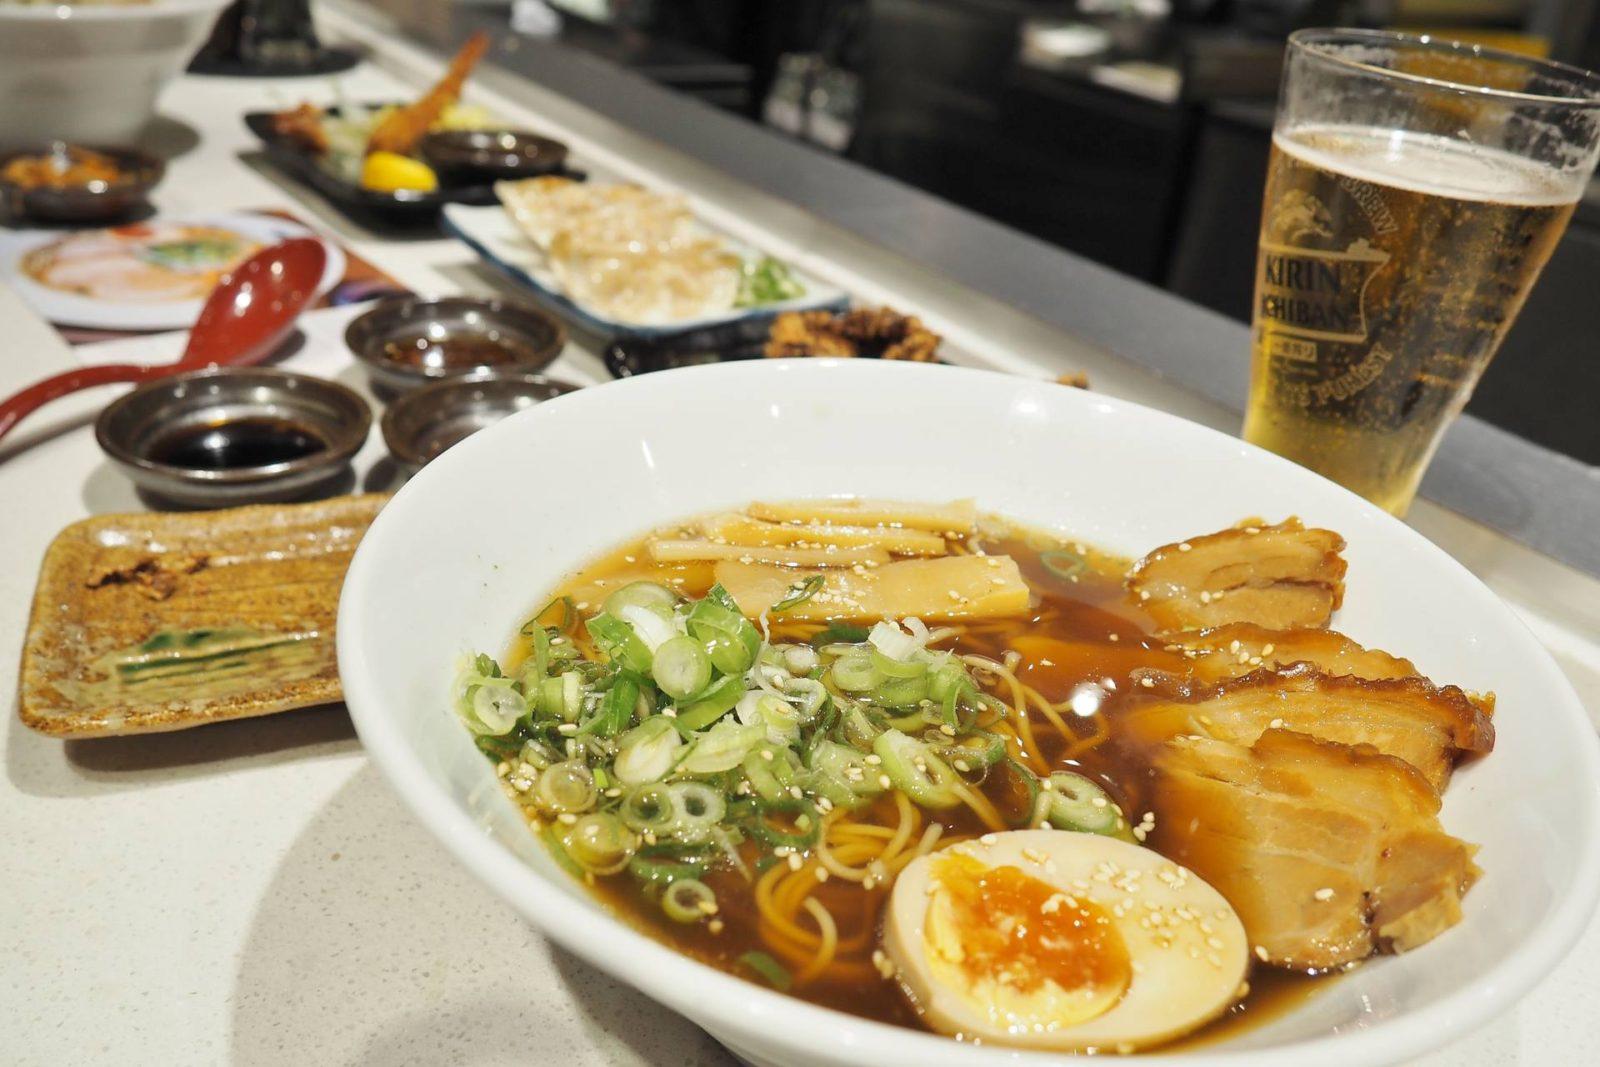 Tonkotsu Menu Birmingham Pork Ramen Noodles Soup